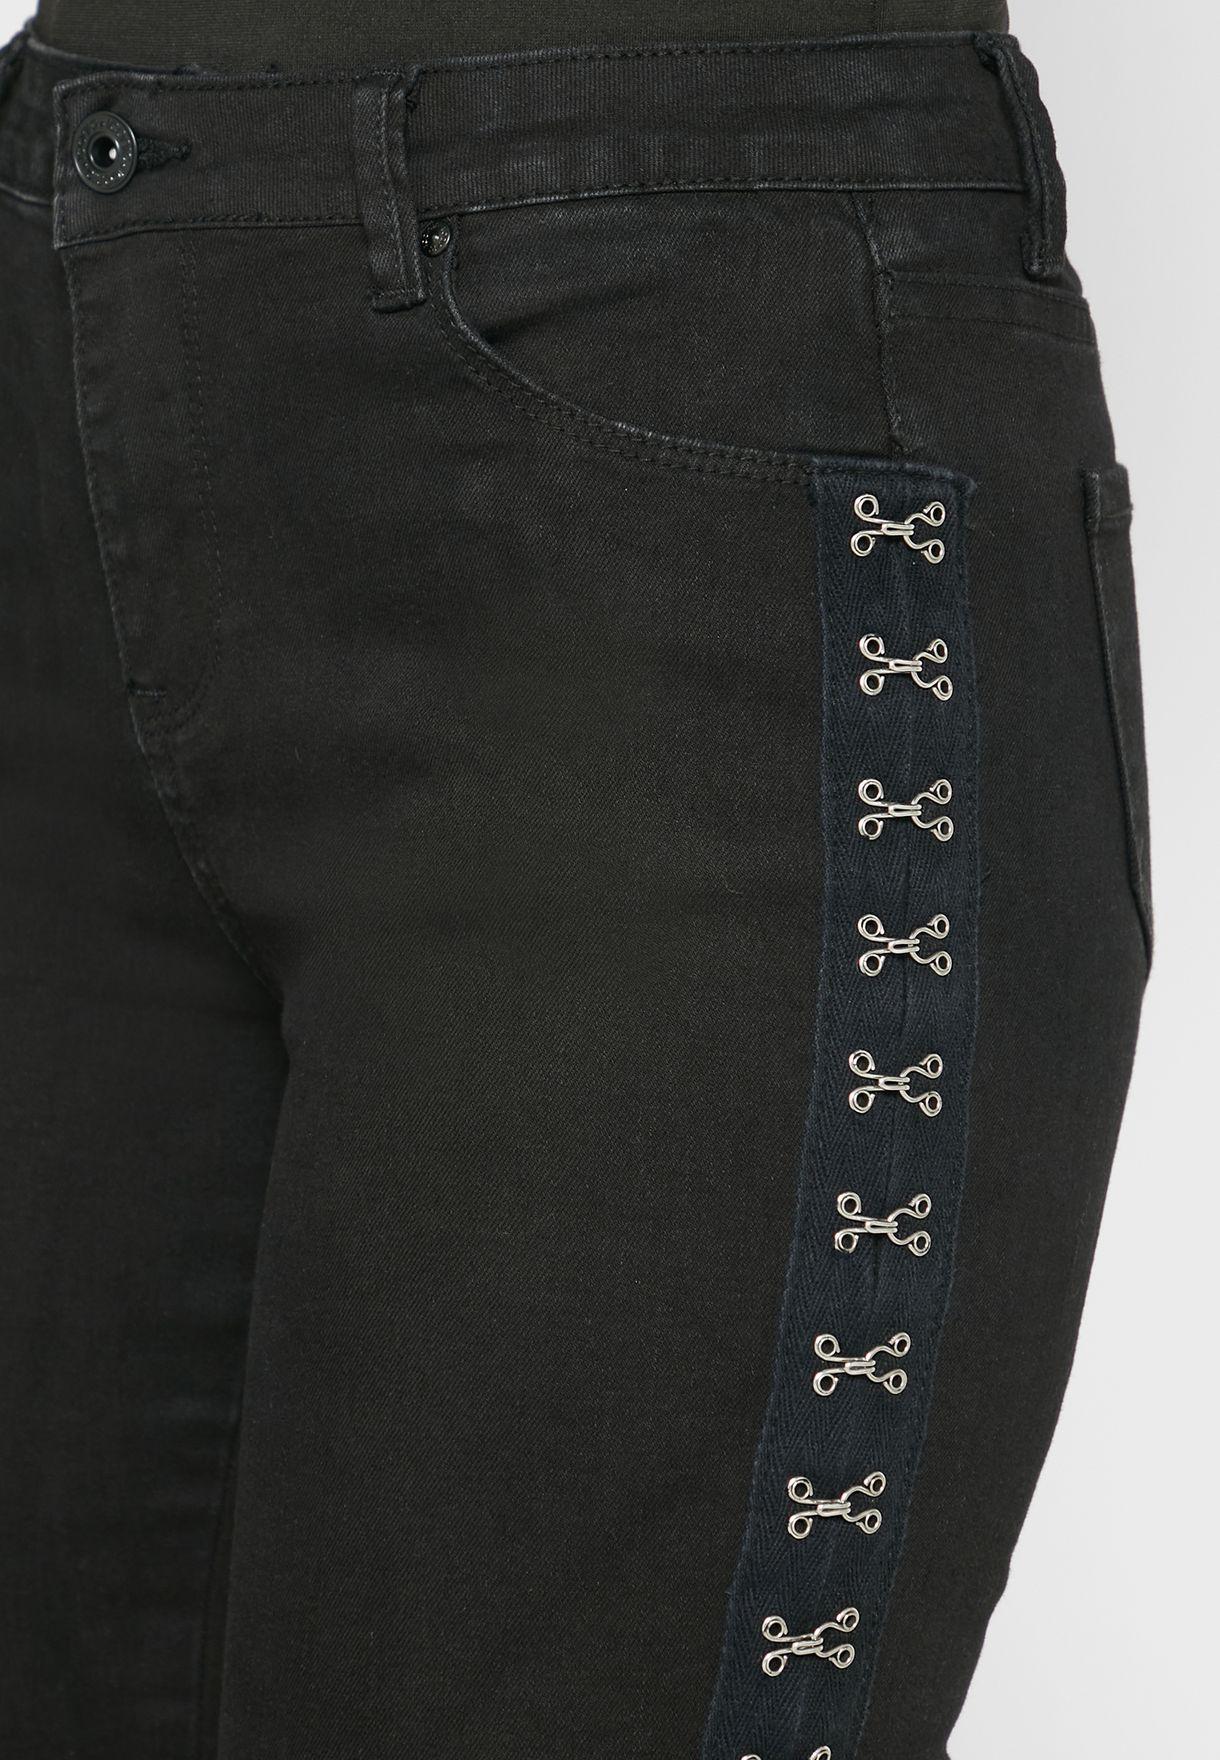 Contrast Trim High Waist Pants